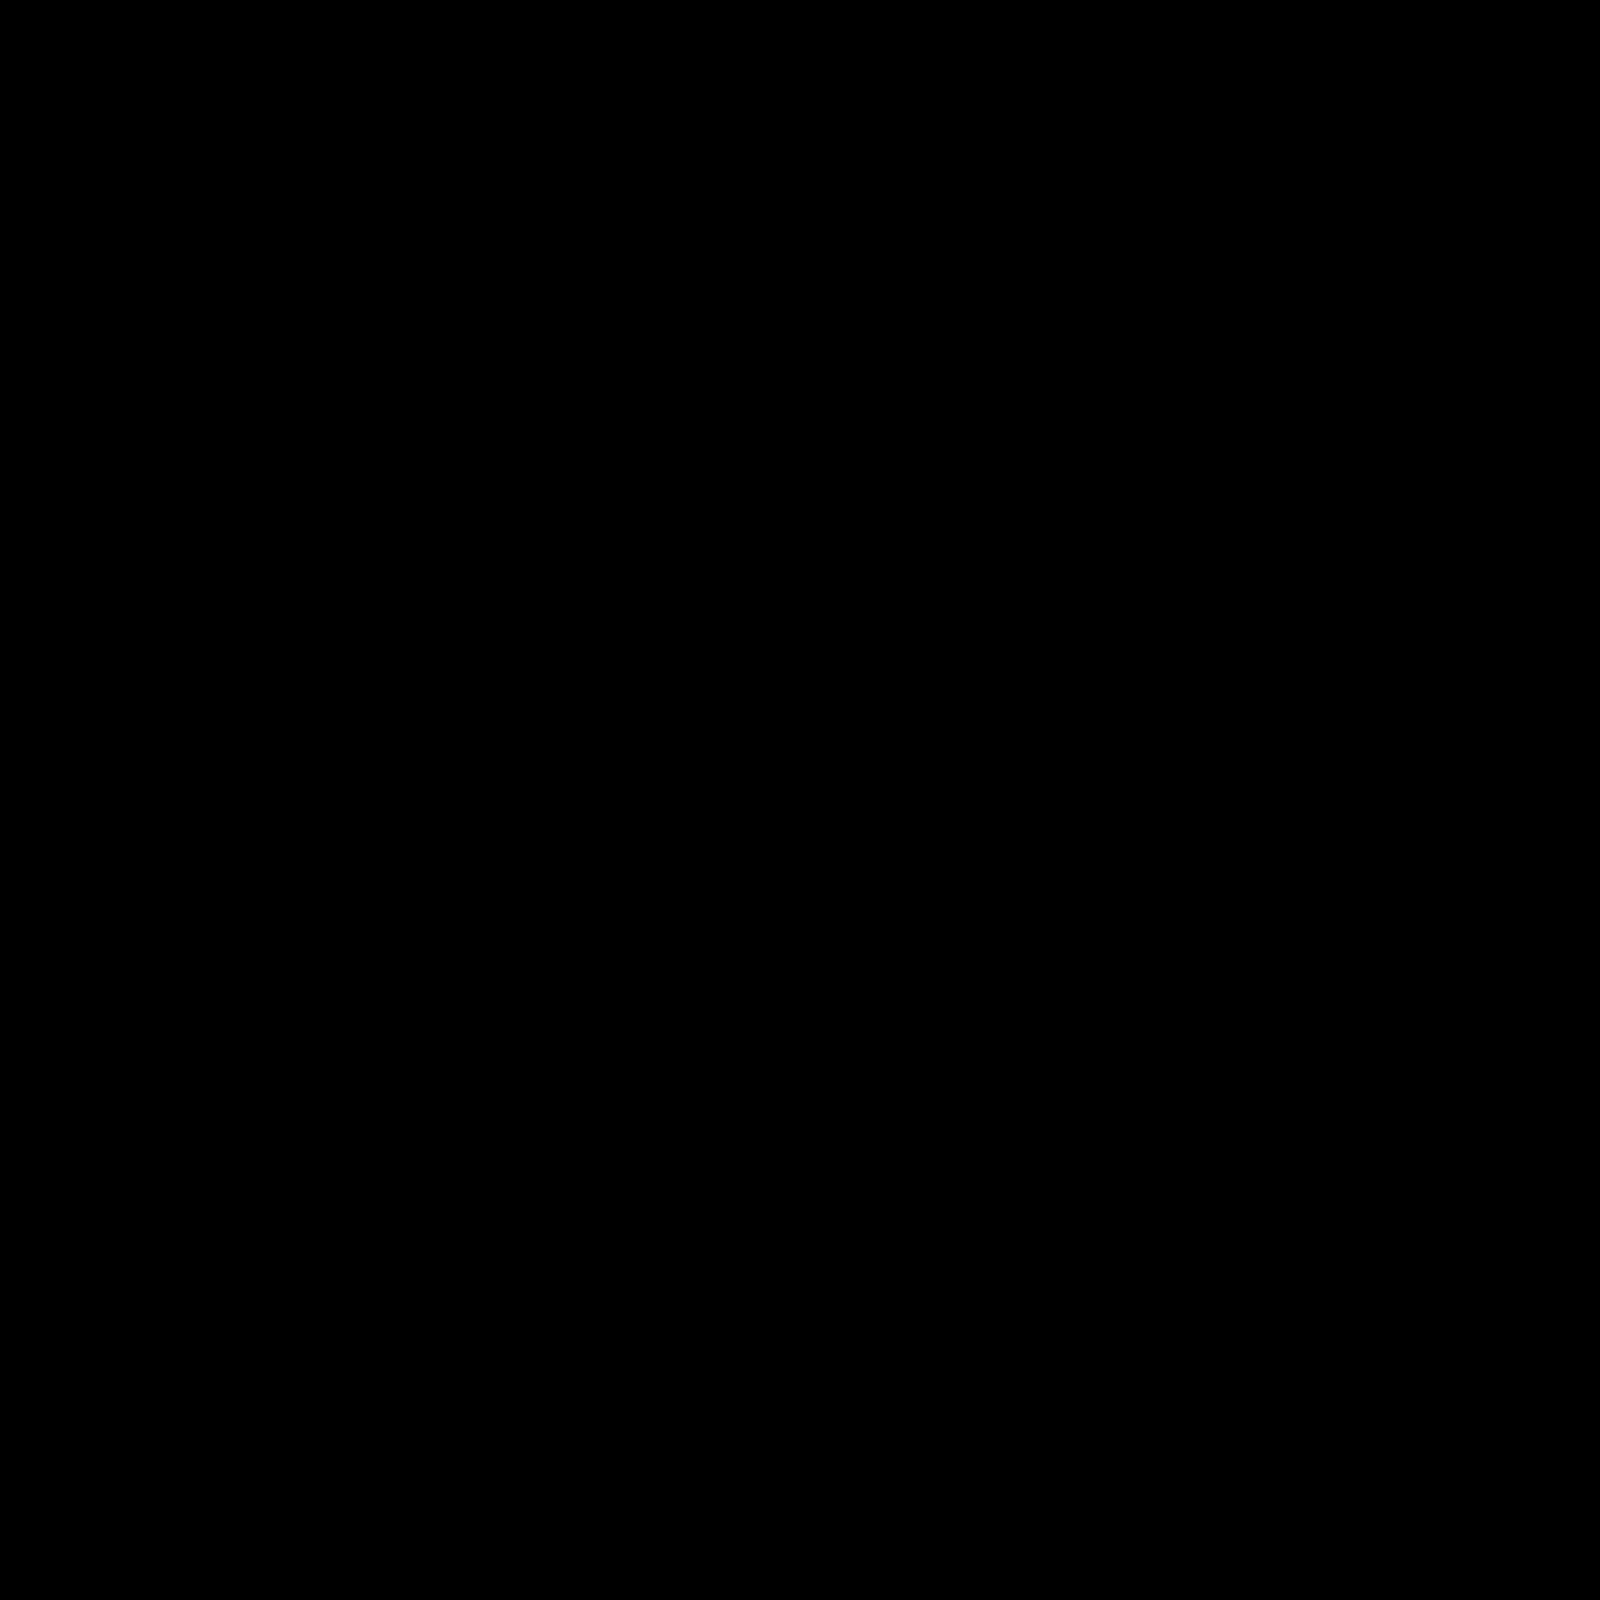 Hiragana Ne icon